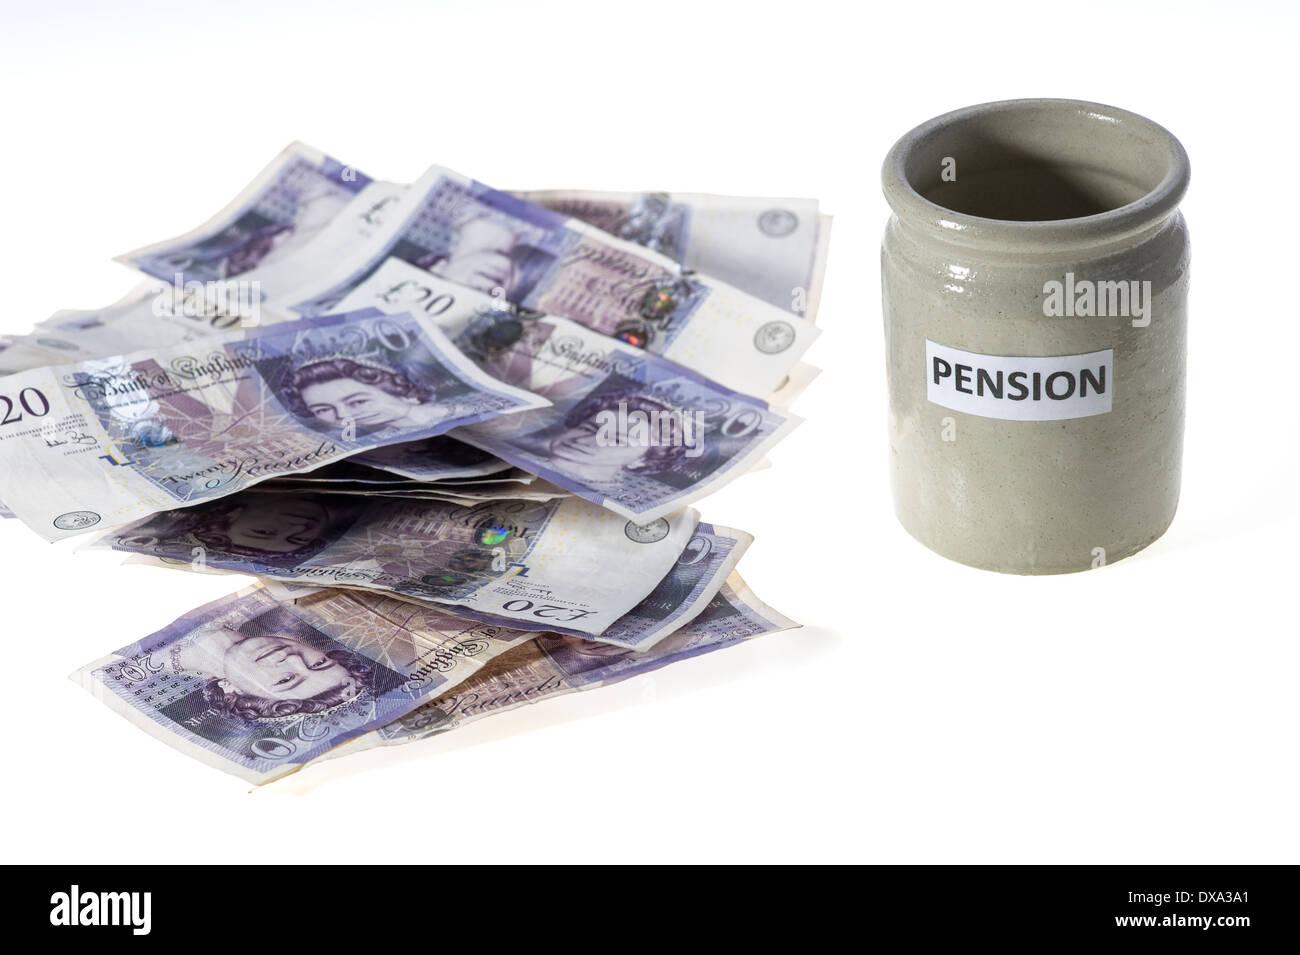 Empty pension pot. - Stock Image